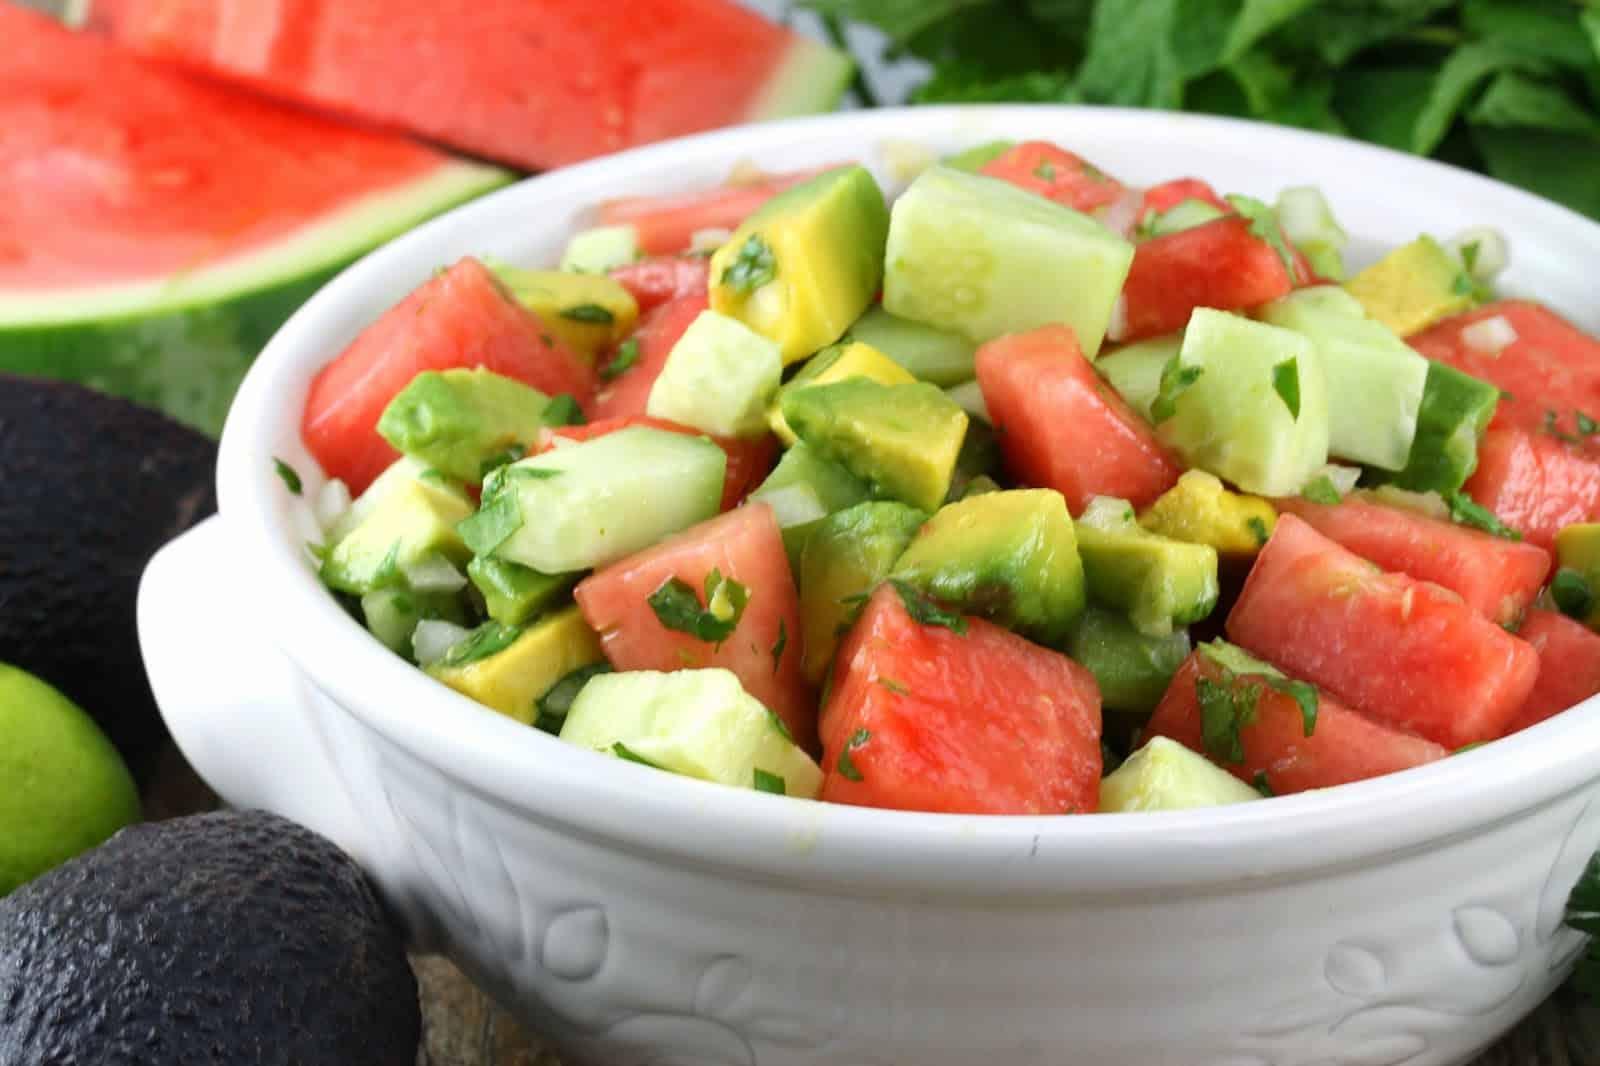 Watermelon, Avocado, Cucumber Salad in a white bowl.